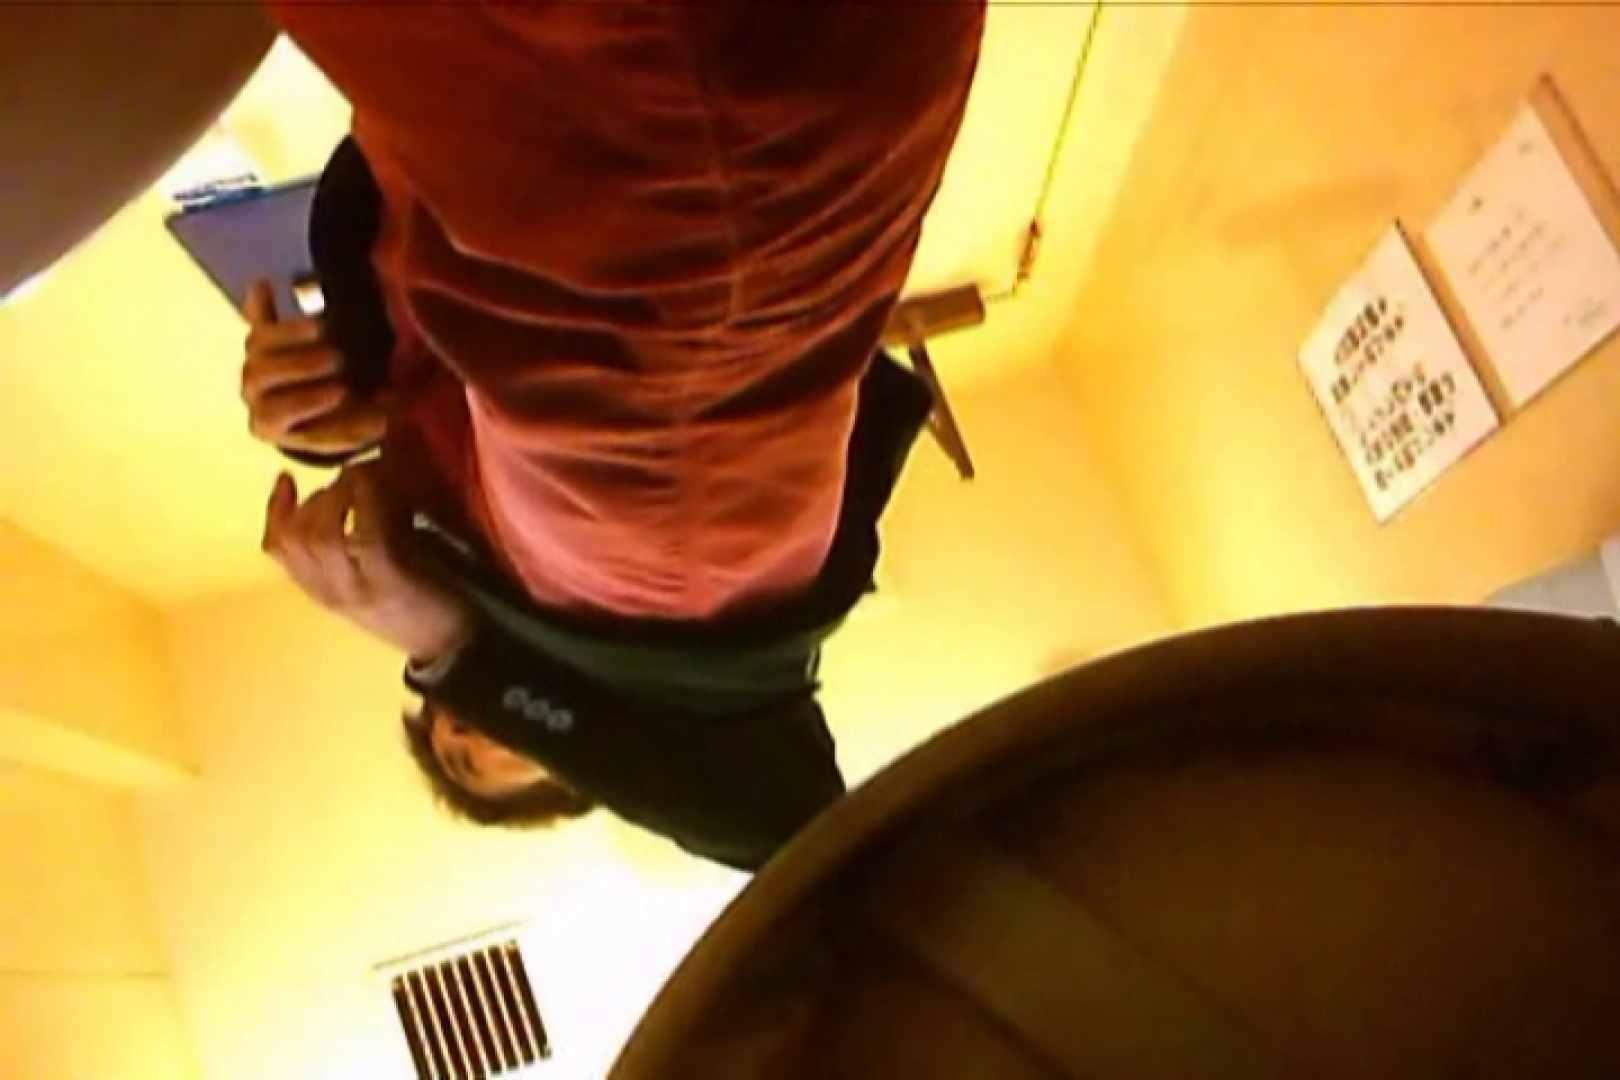 SEASON 2ND!掴み取りさんの洗面所覗き!in新幹線!VOL.04 リーマン系男子 ゲイ無修正ビデオ画像 63枚 31